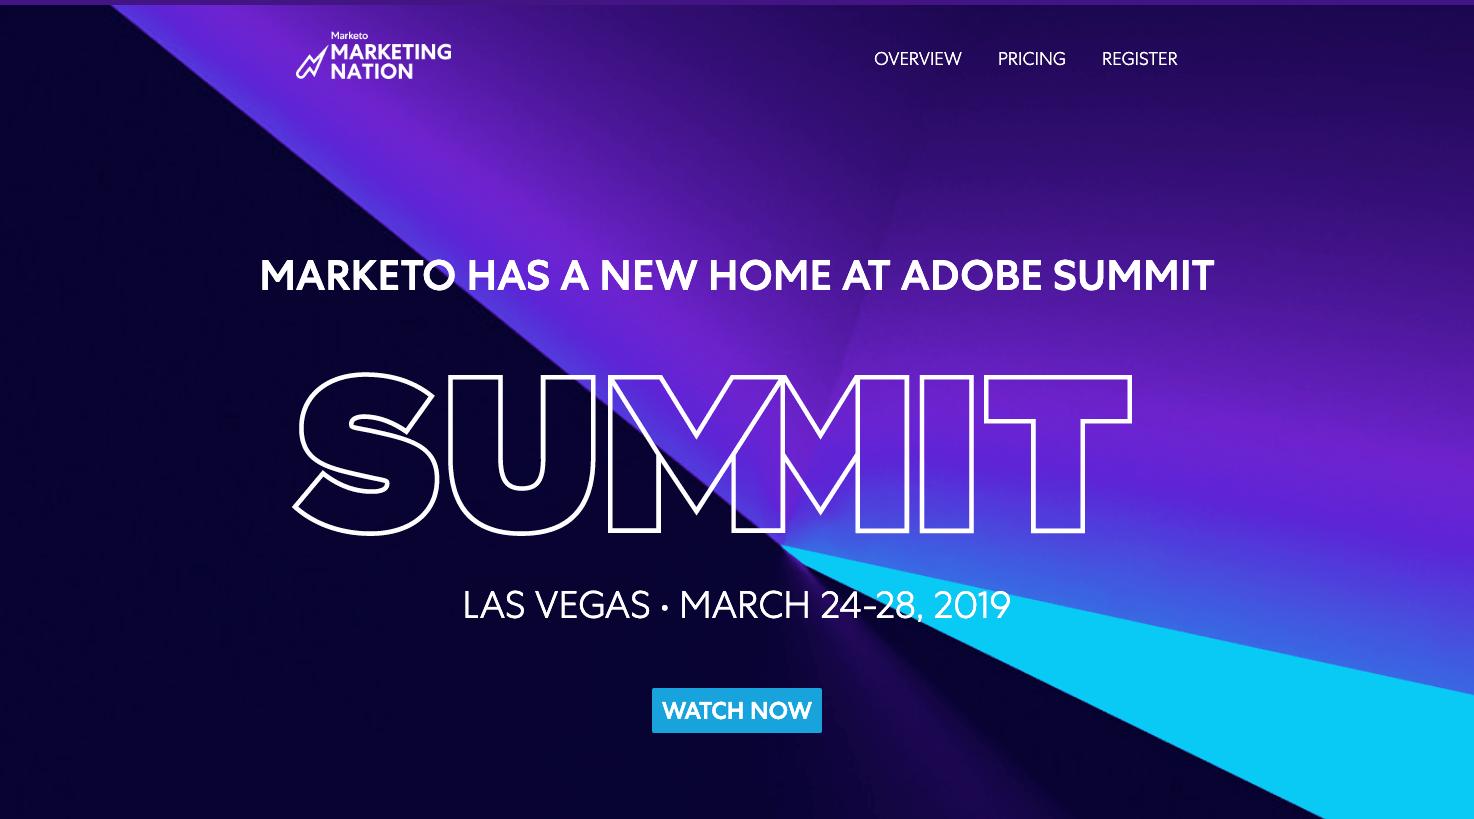 Marketo Summit Example - Event Marketing Guide 2020